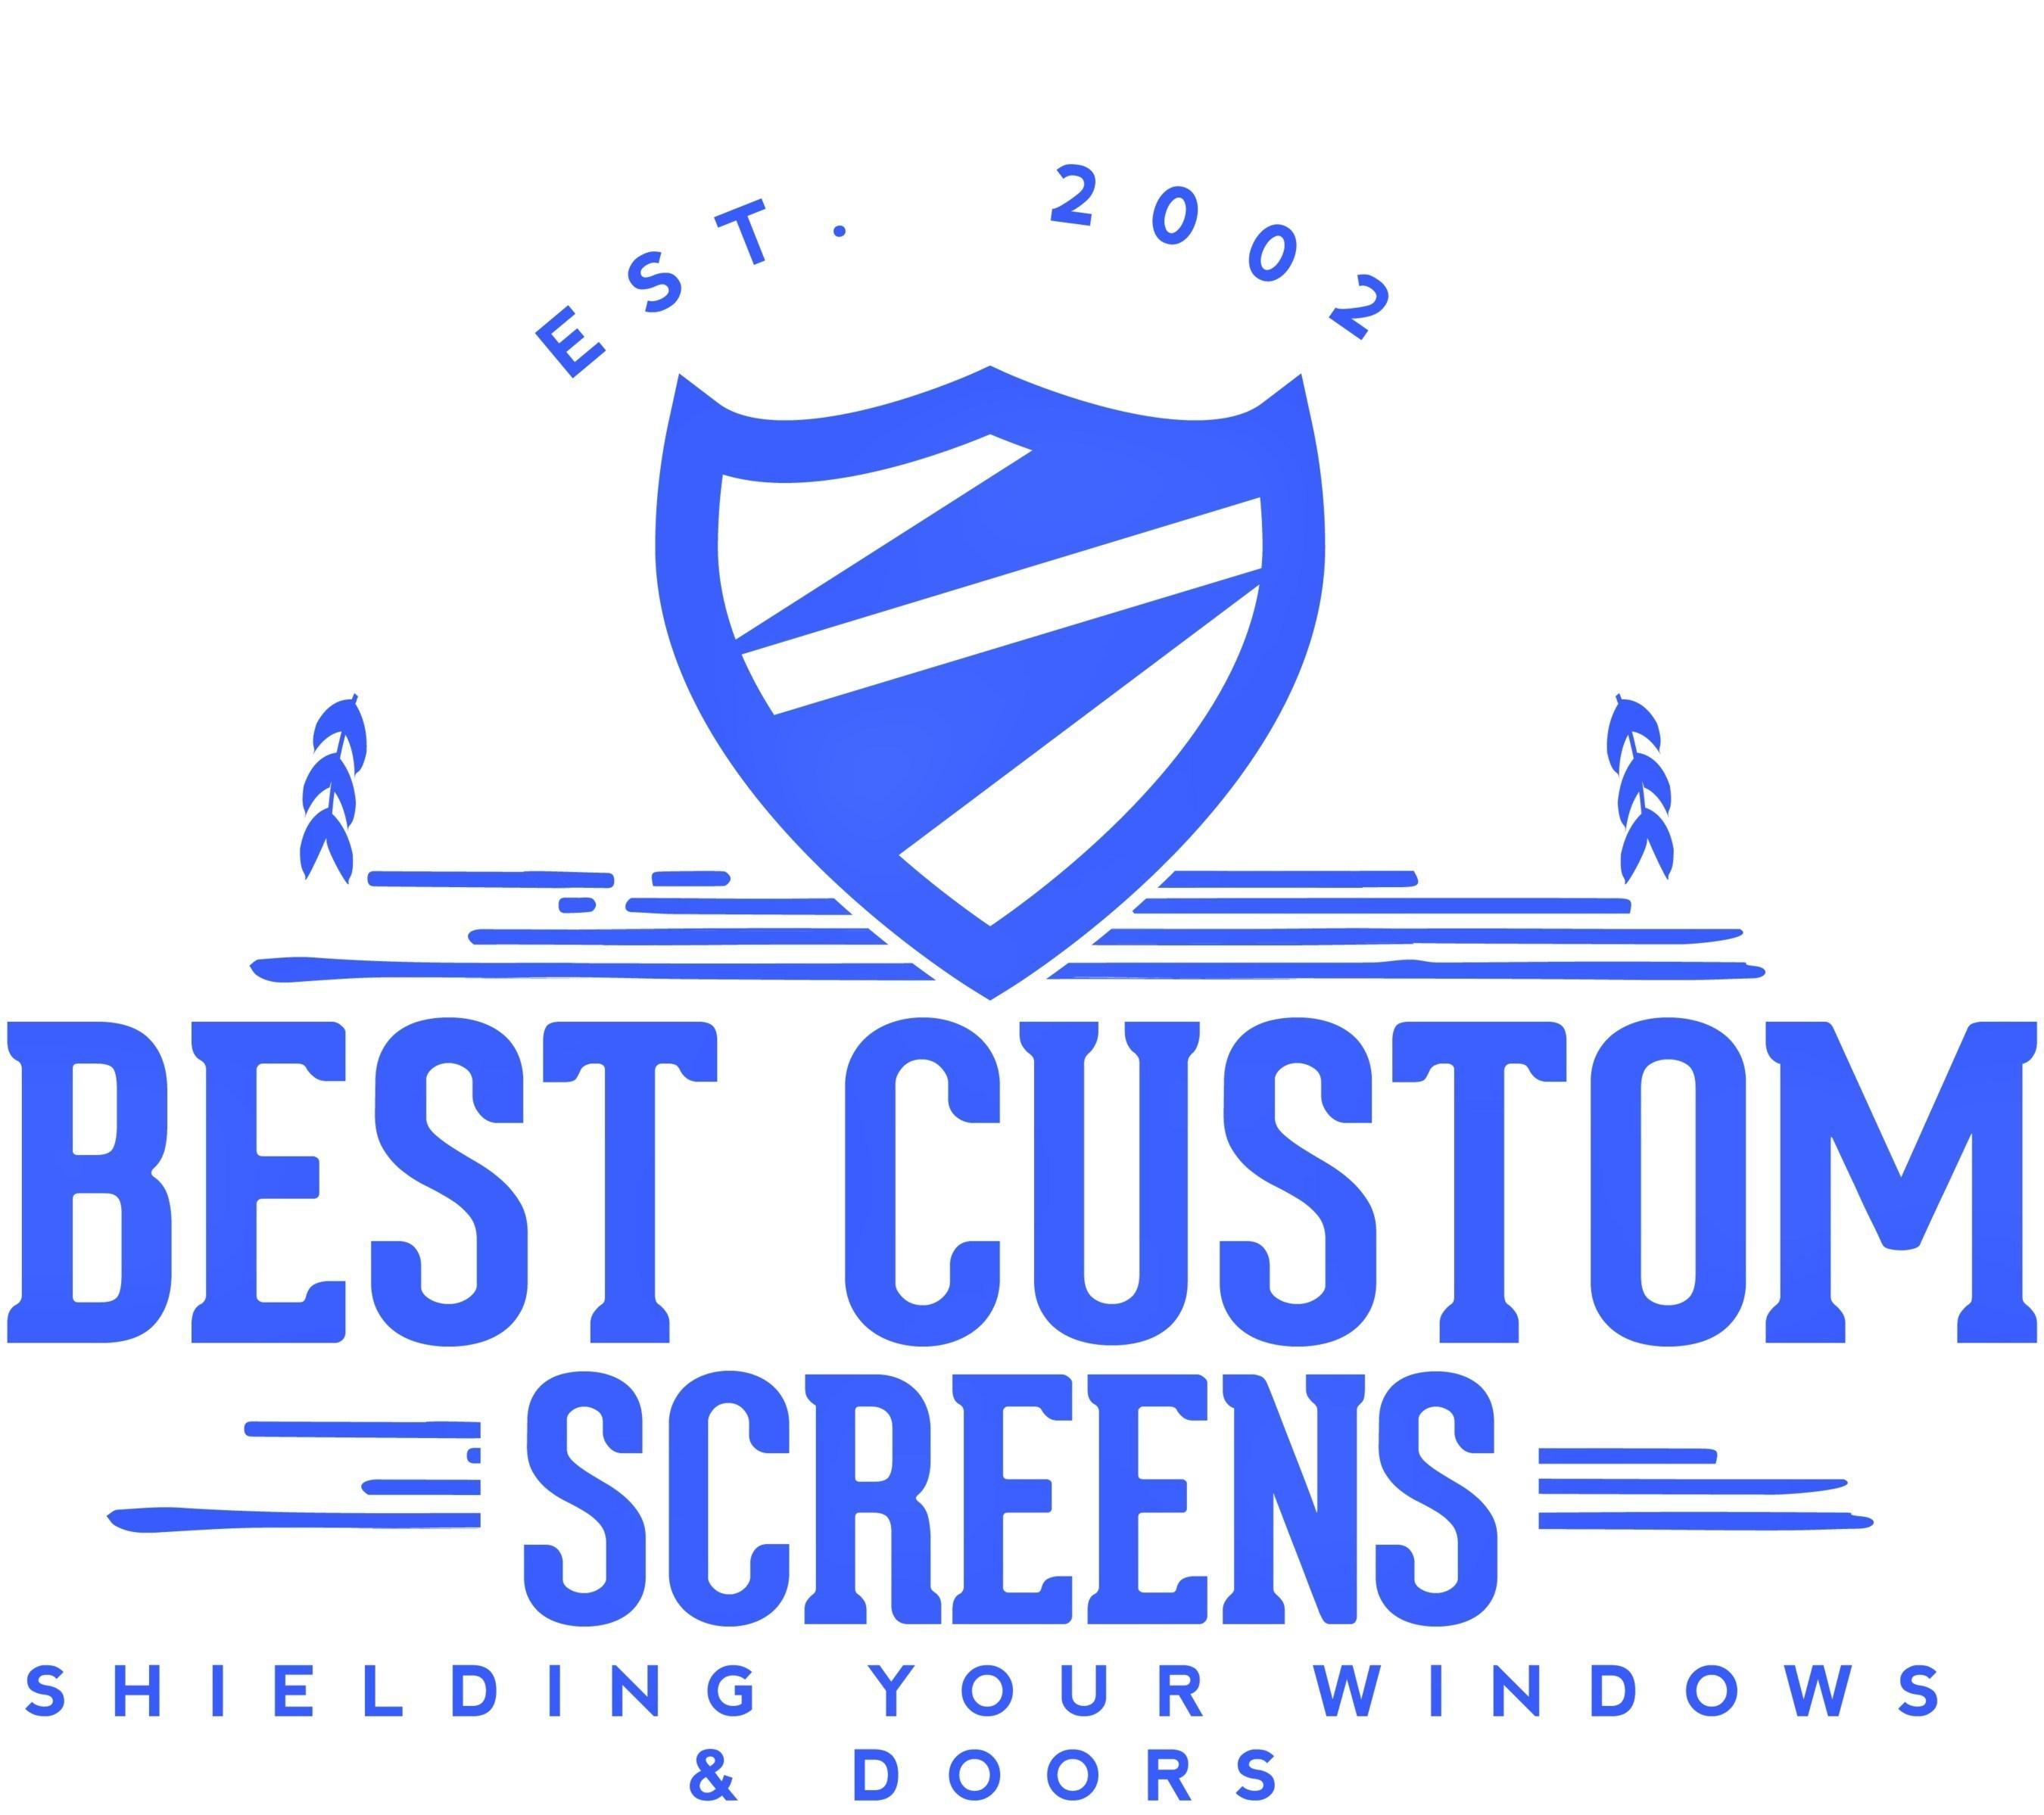 Classic Retro logo of Best Custom Screens designed to show how the company SHIELDS WINDOWS AND DOORS